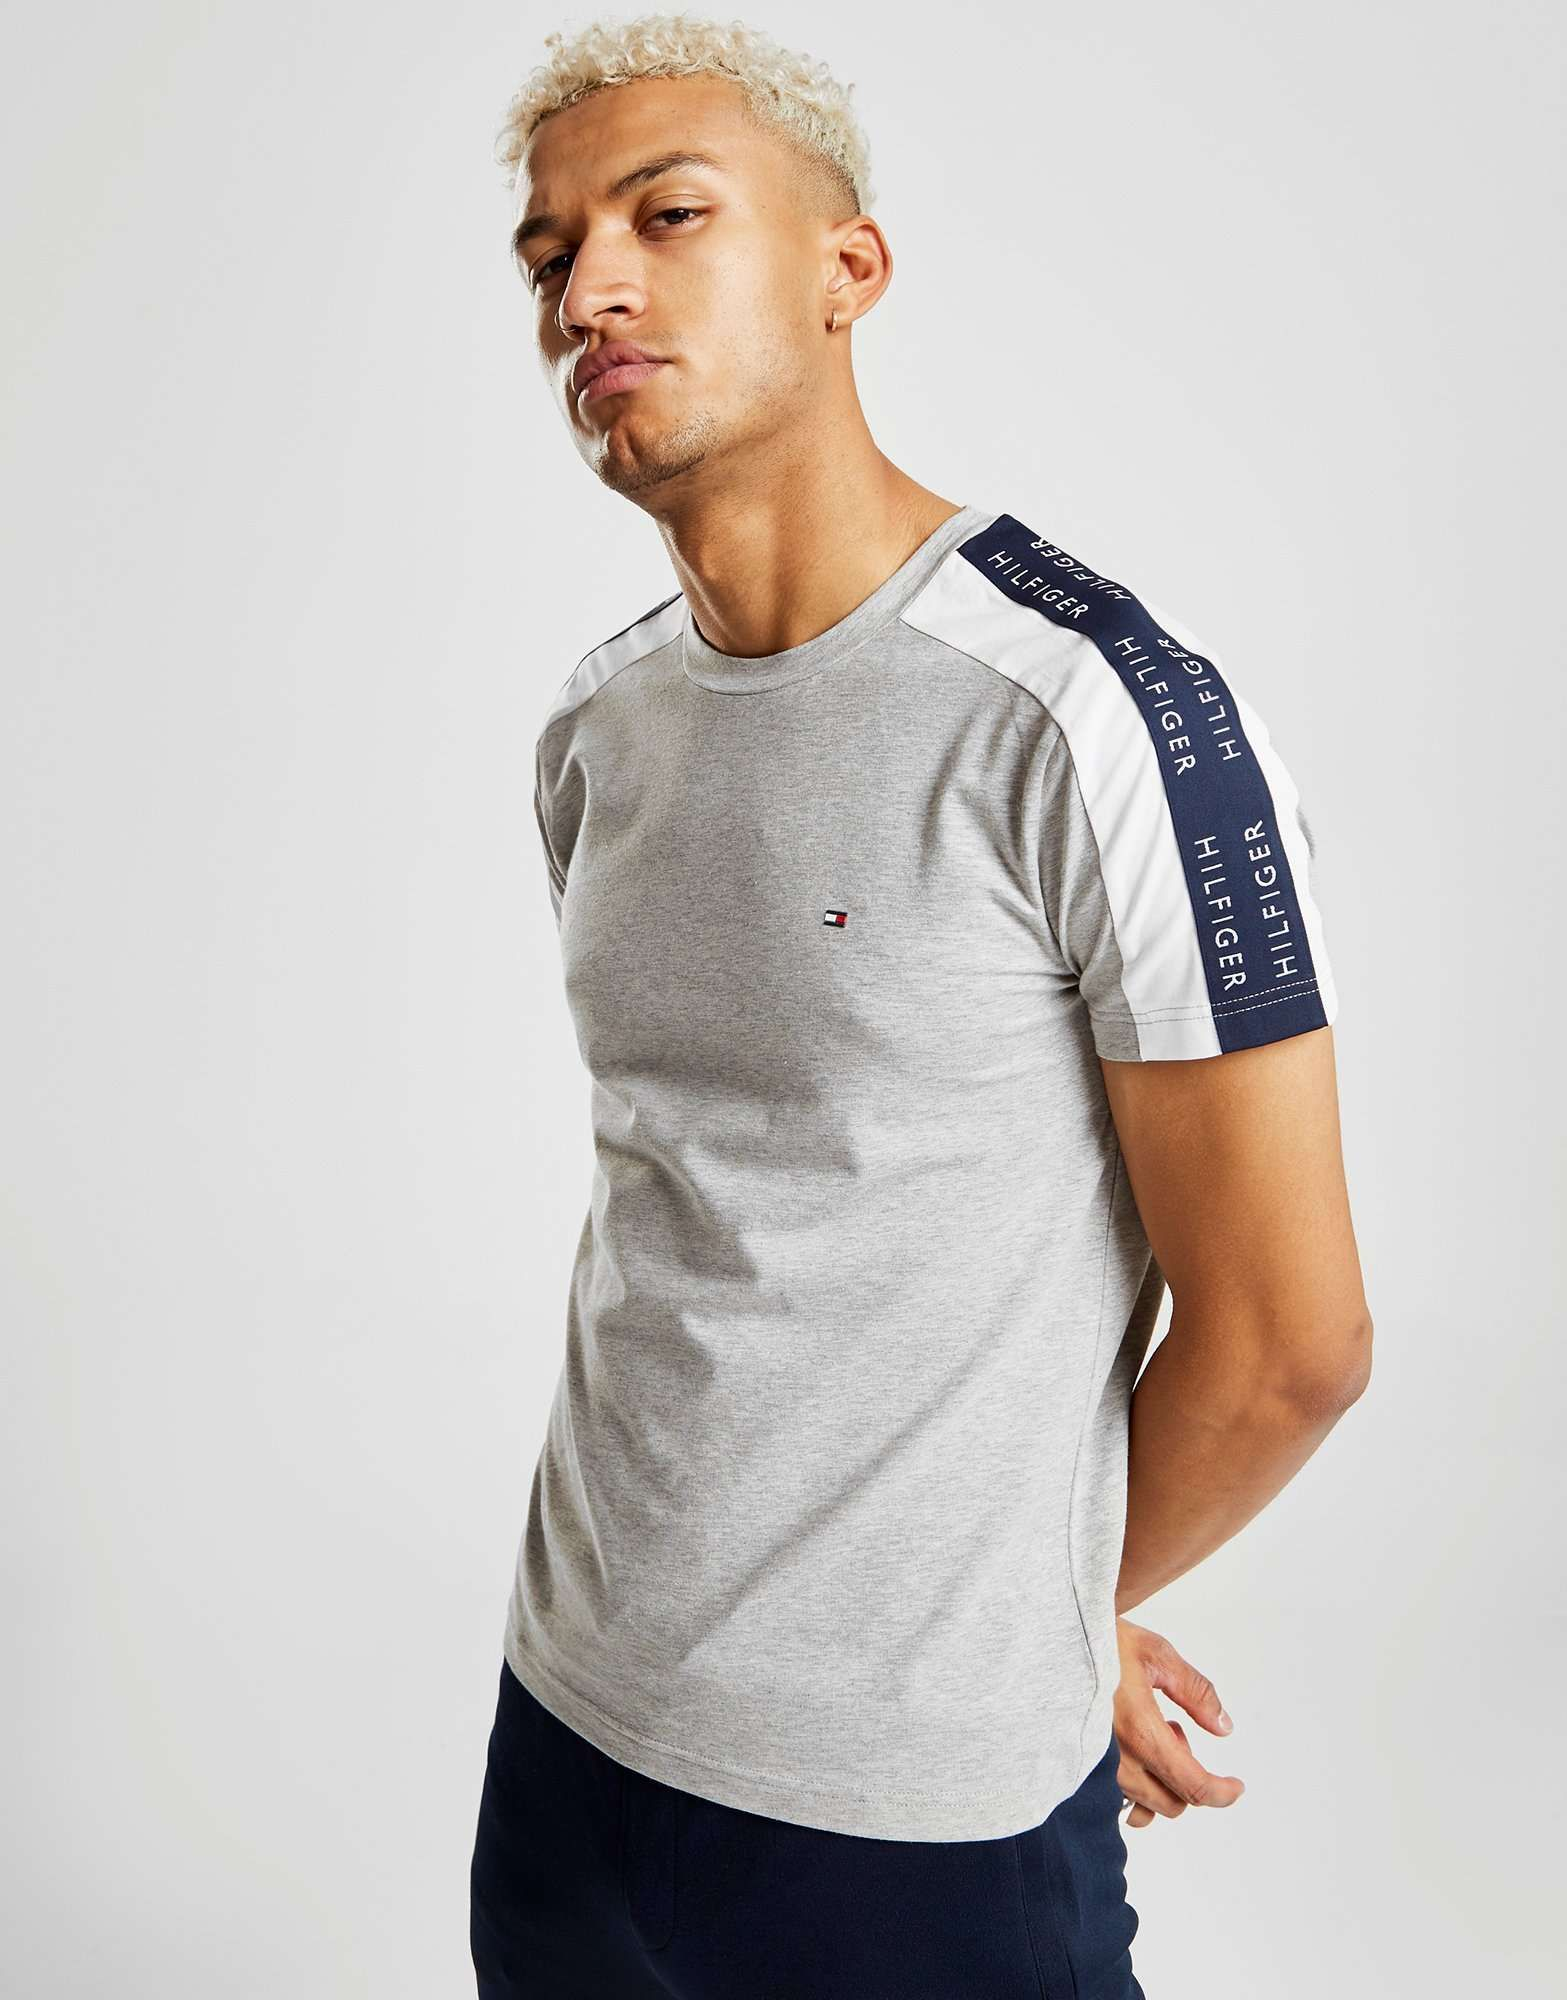 0f5eebcf959 Tommy Hilfiger Contrast Tape Short Sleeve T-Shirt - Shop online for Tommy  Hilfiger Contrast Tape Short Sleeve T-Shirt with JD Sports